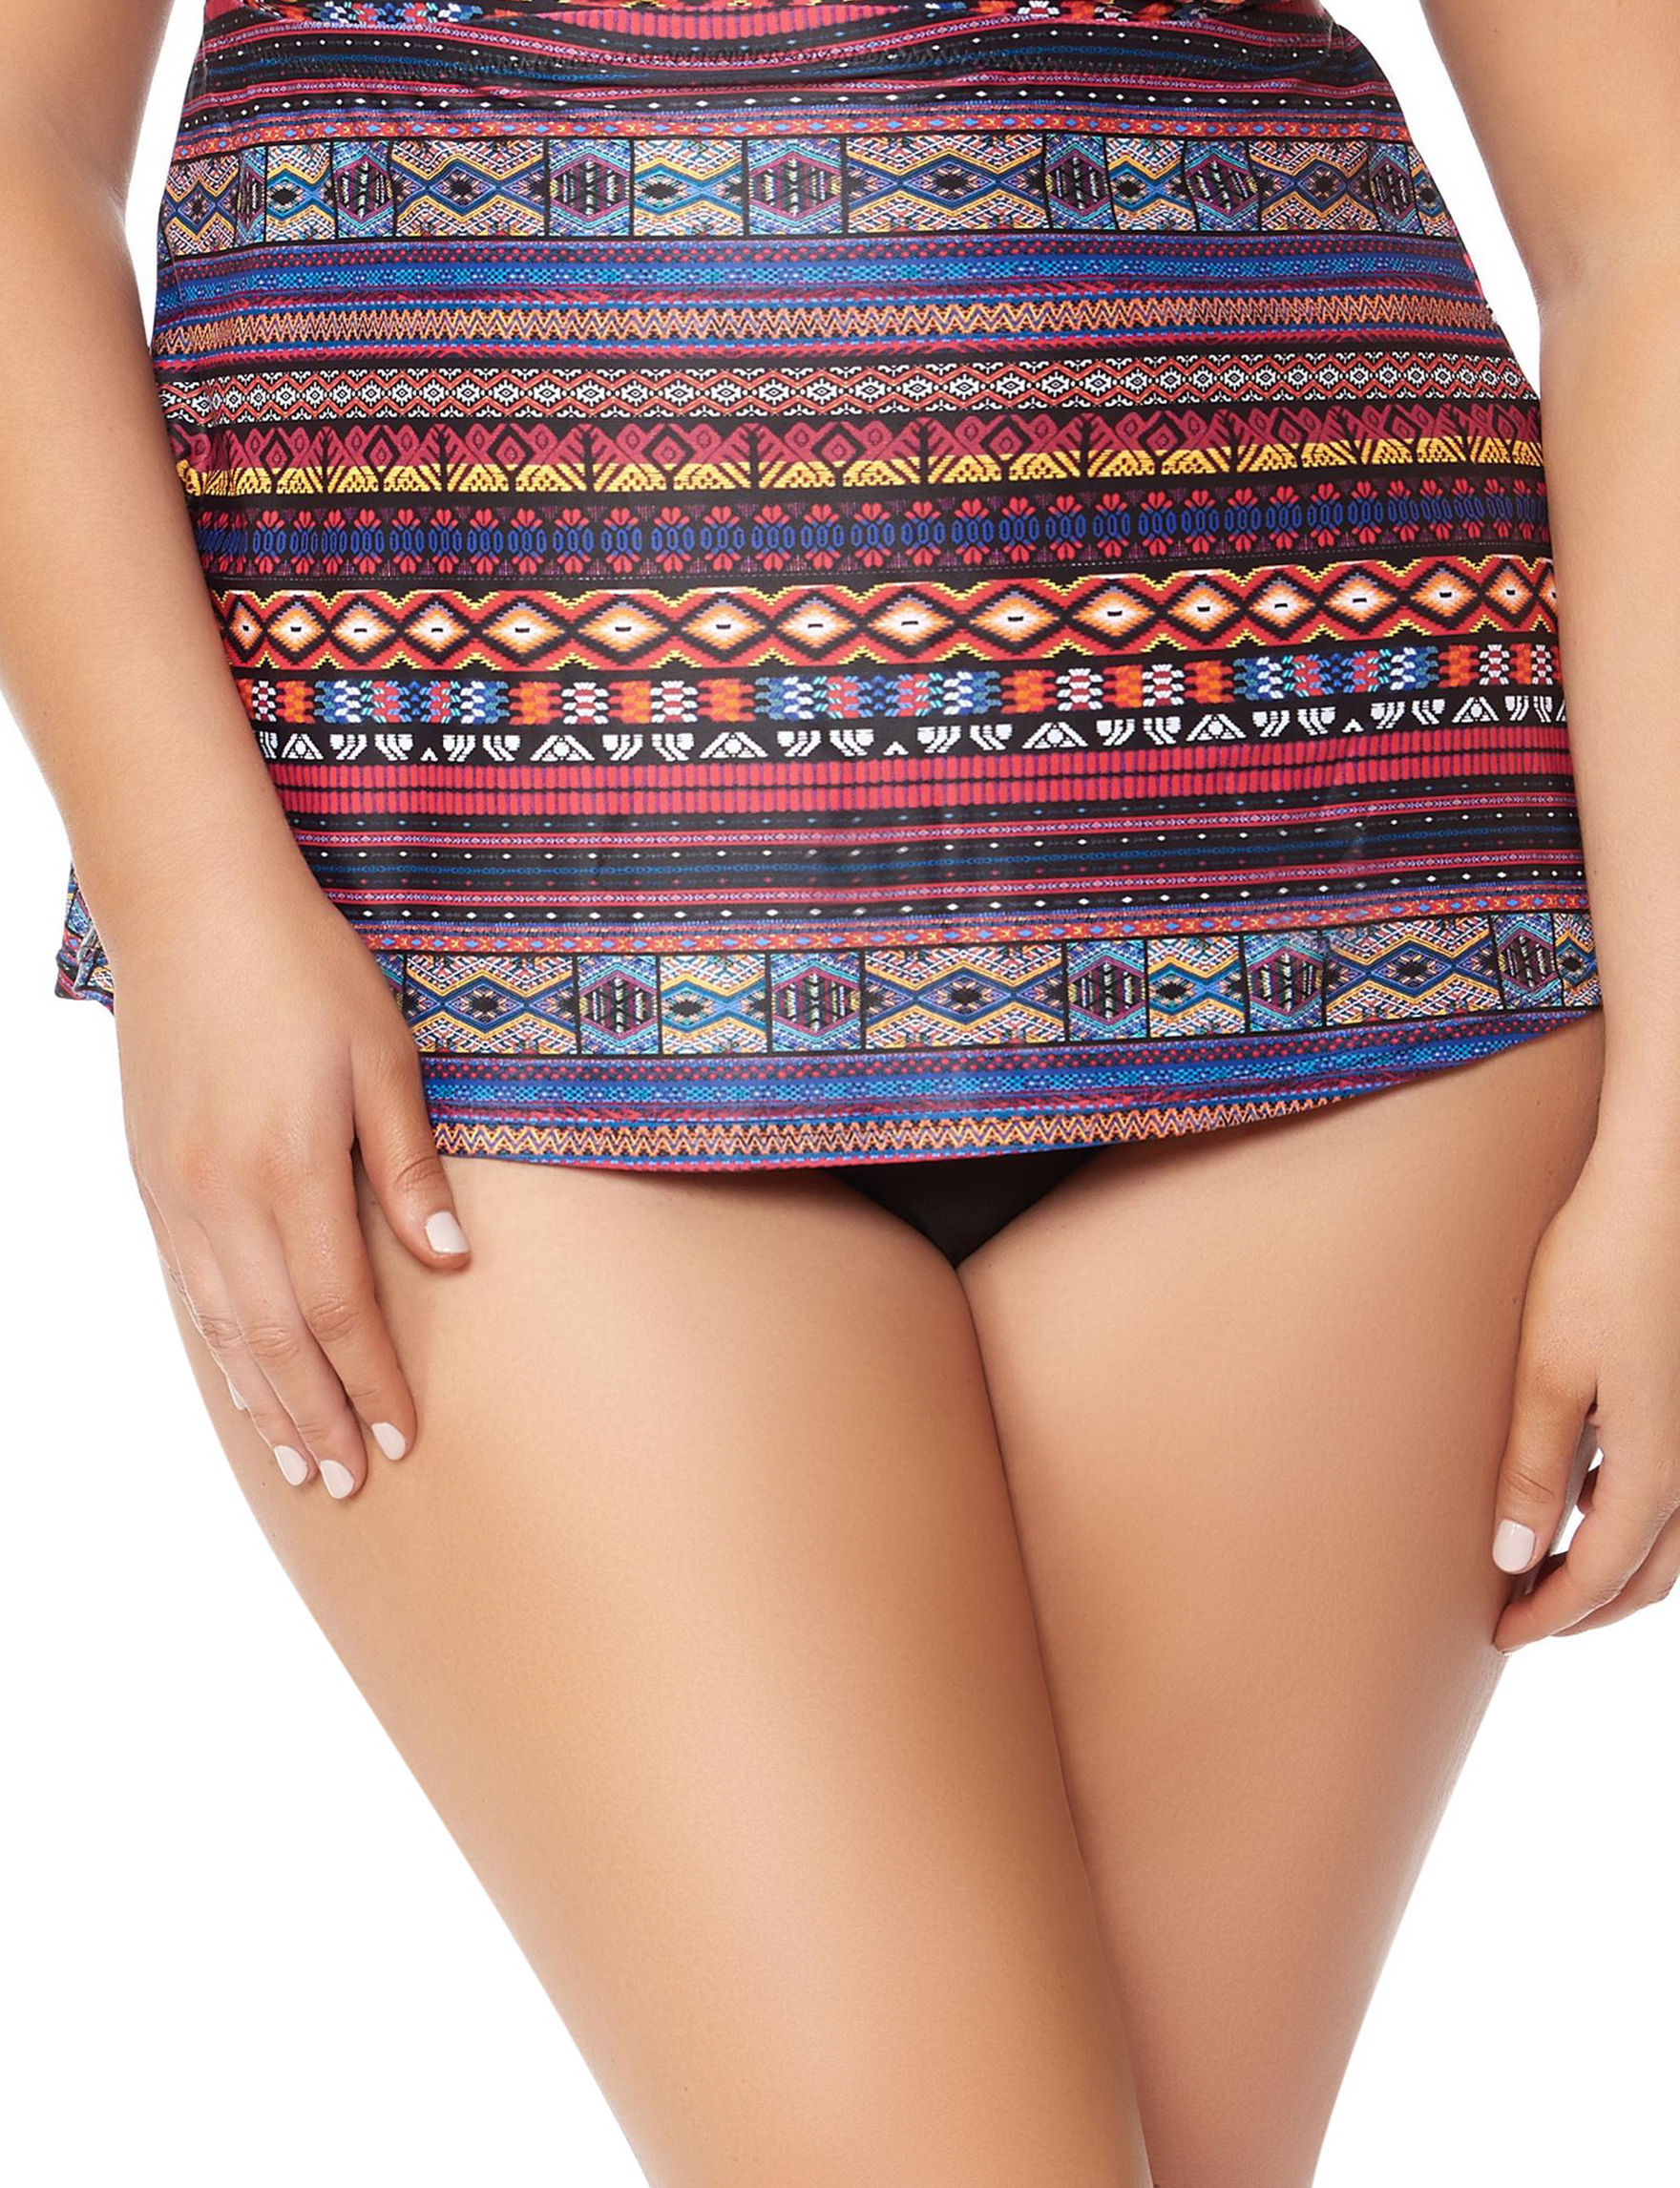 Jessica Simpson Black Swimsuit Bottoms High Waist